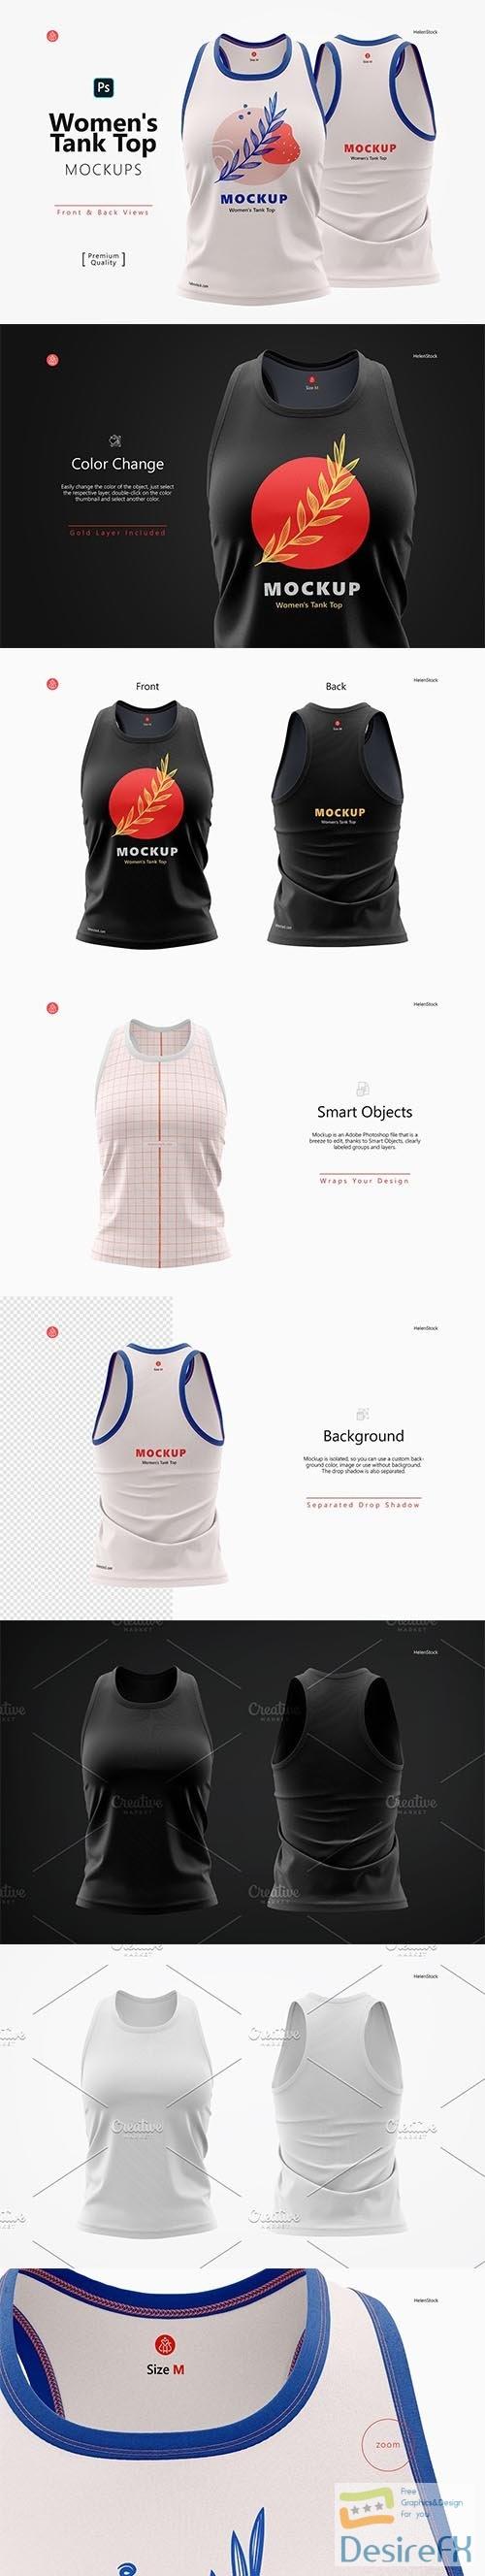 CreativeMarket - Women's Tank Top Mockups, Front Back 6529119